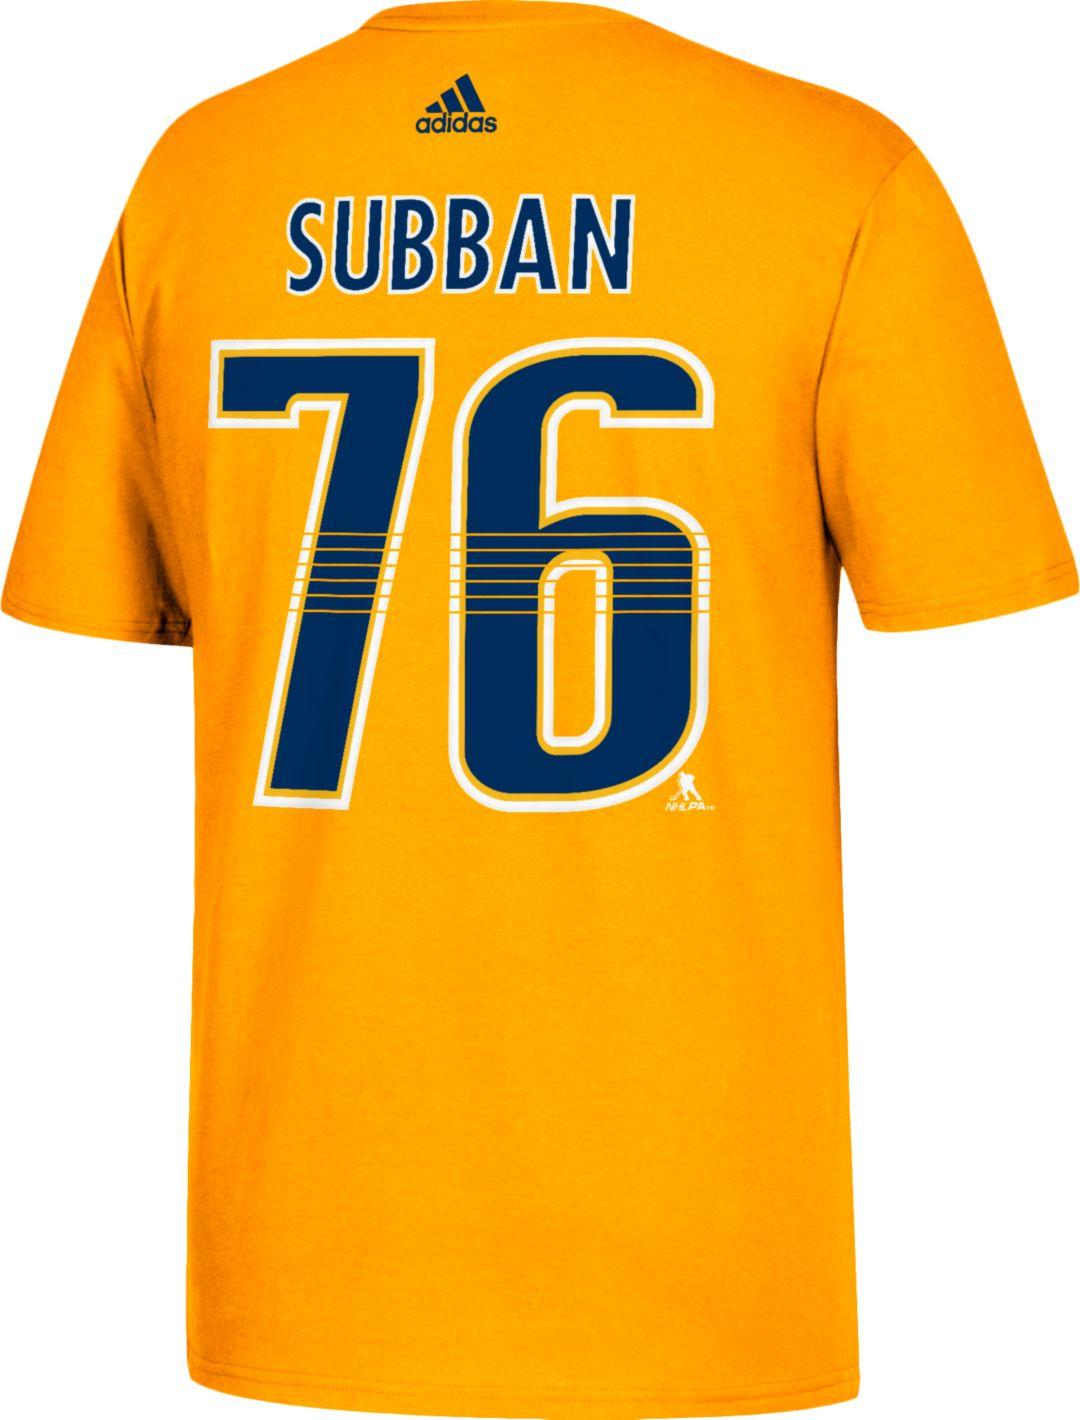 info for f7d3e 4db42 adidas Men's Nashville Predators P.K. Subban #76 Gold T-Shirt